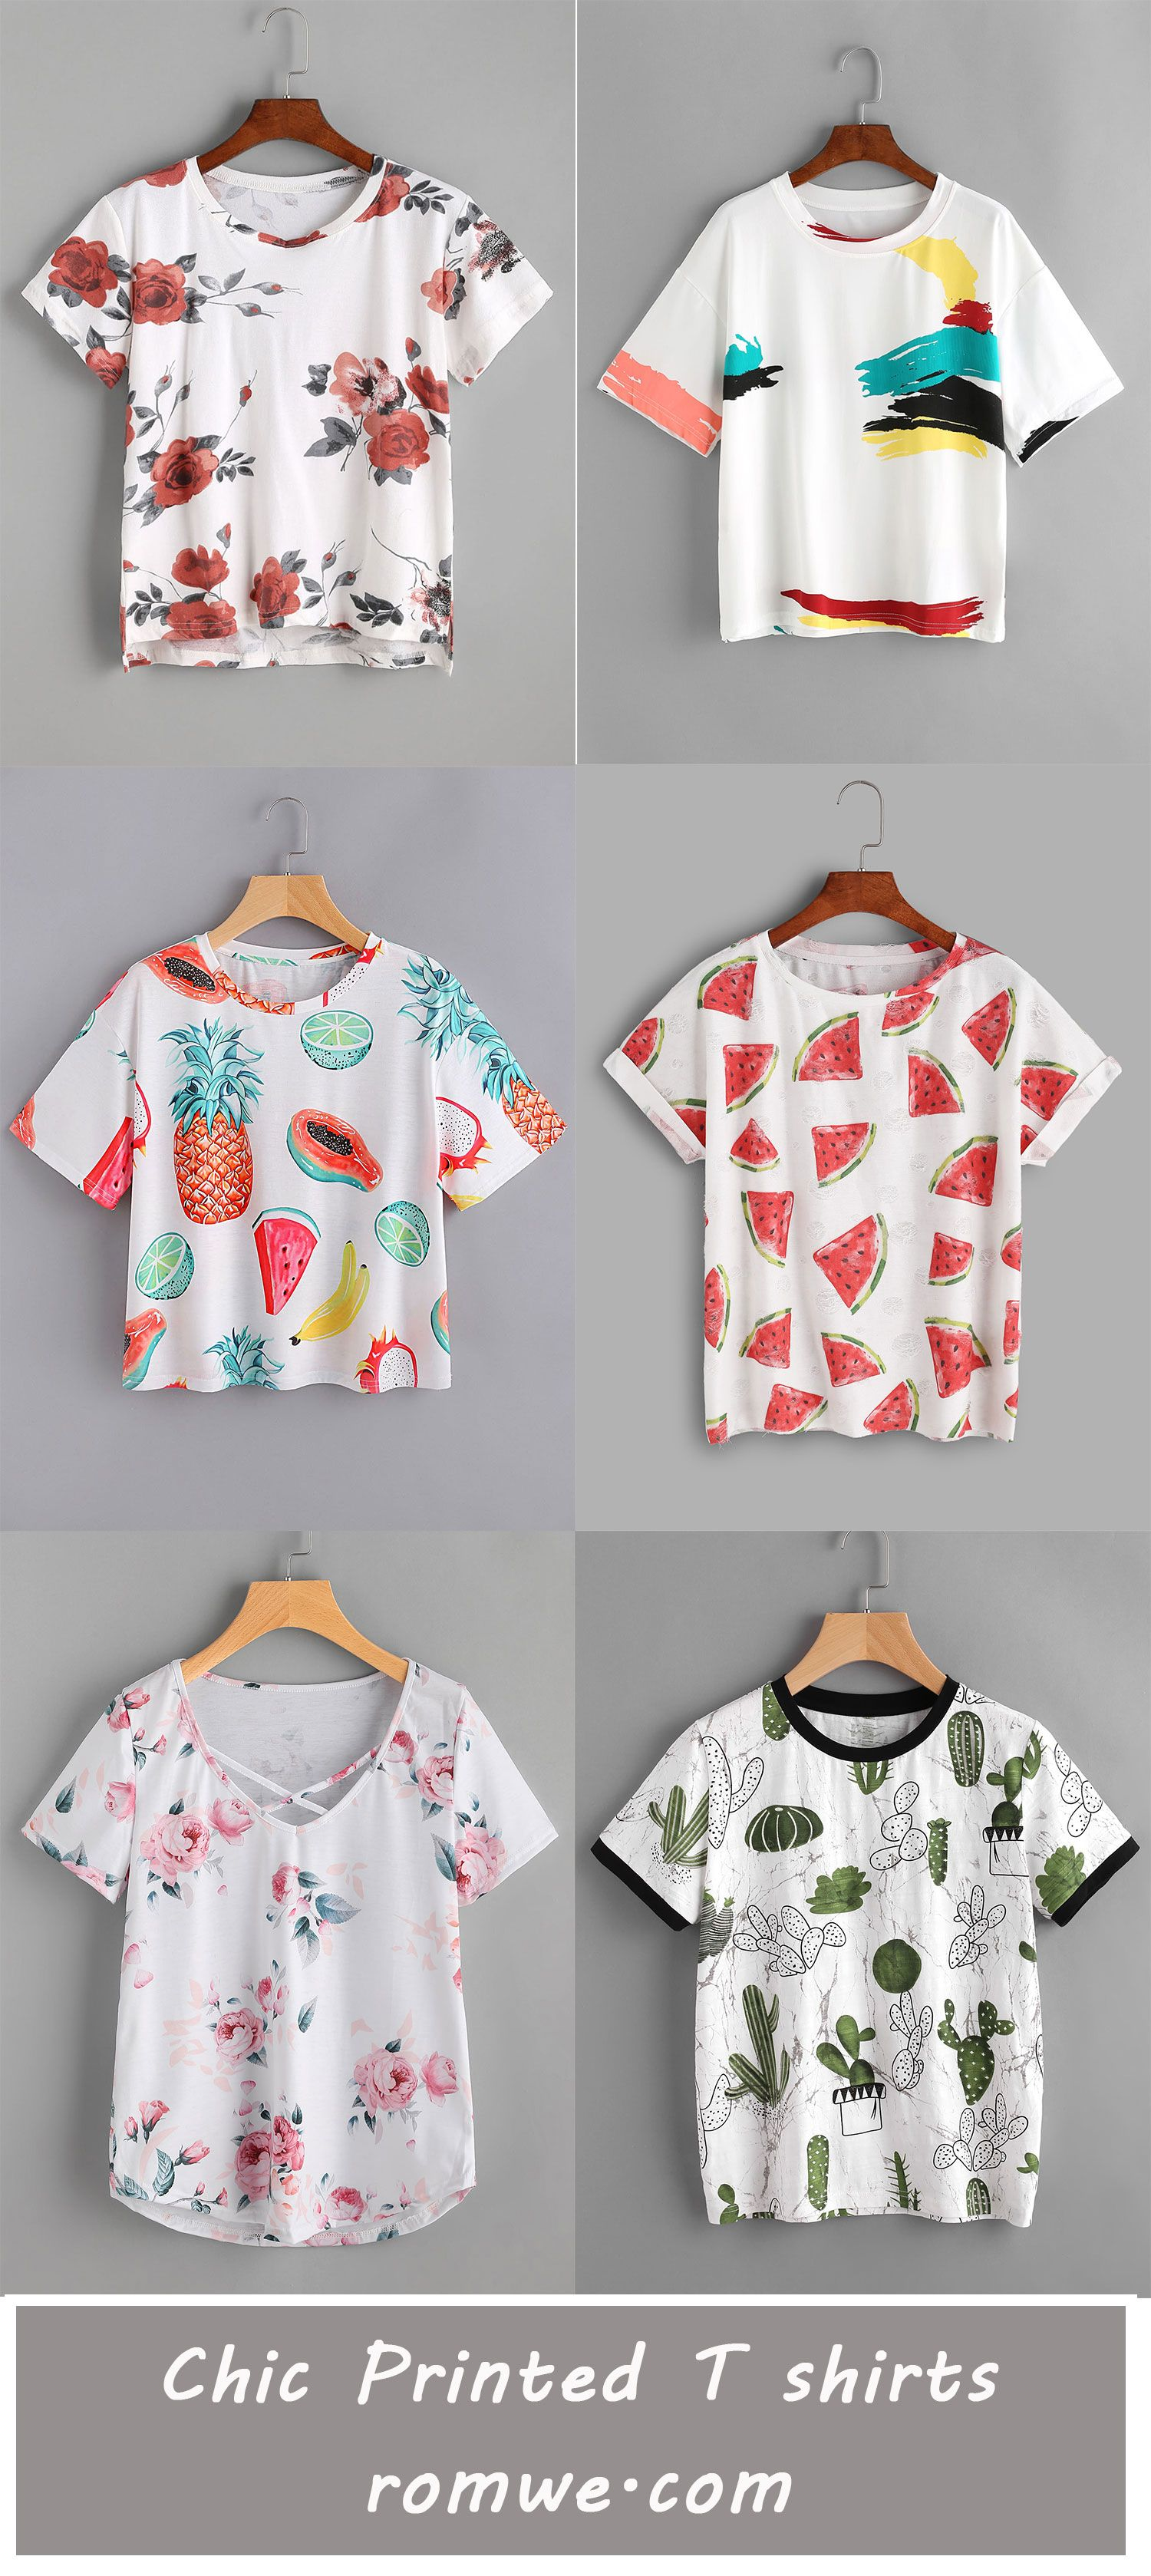 Chic Printed T shirts 2017 - romwe.com